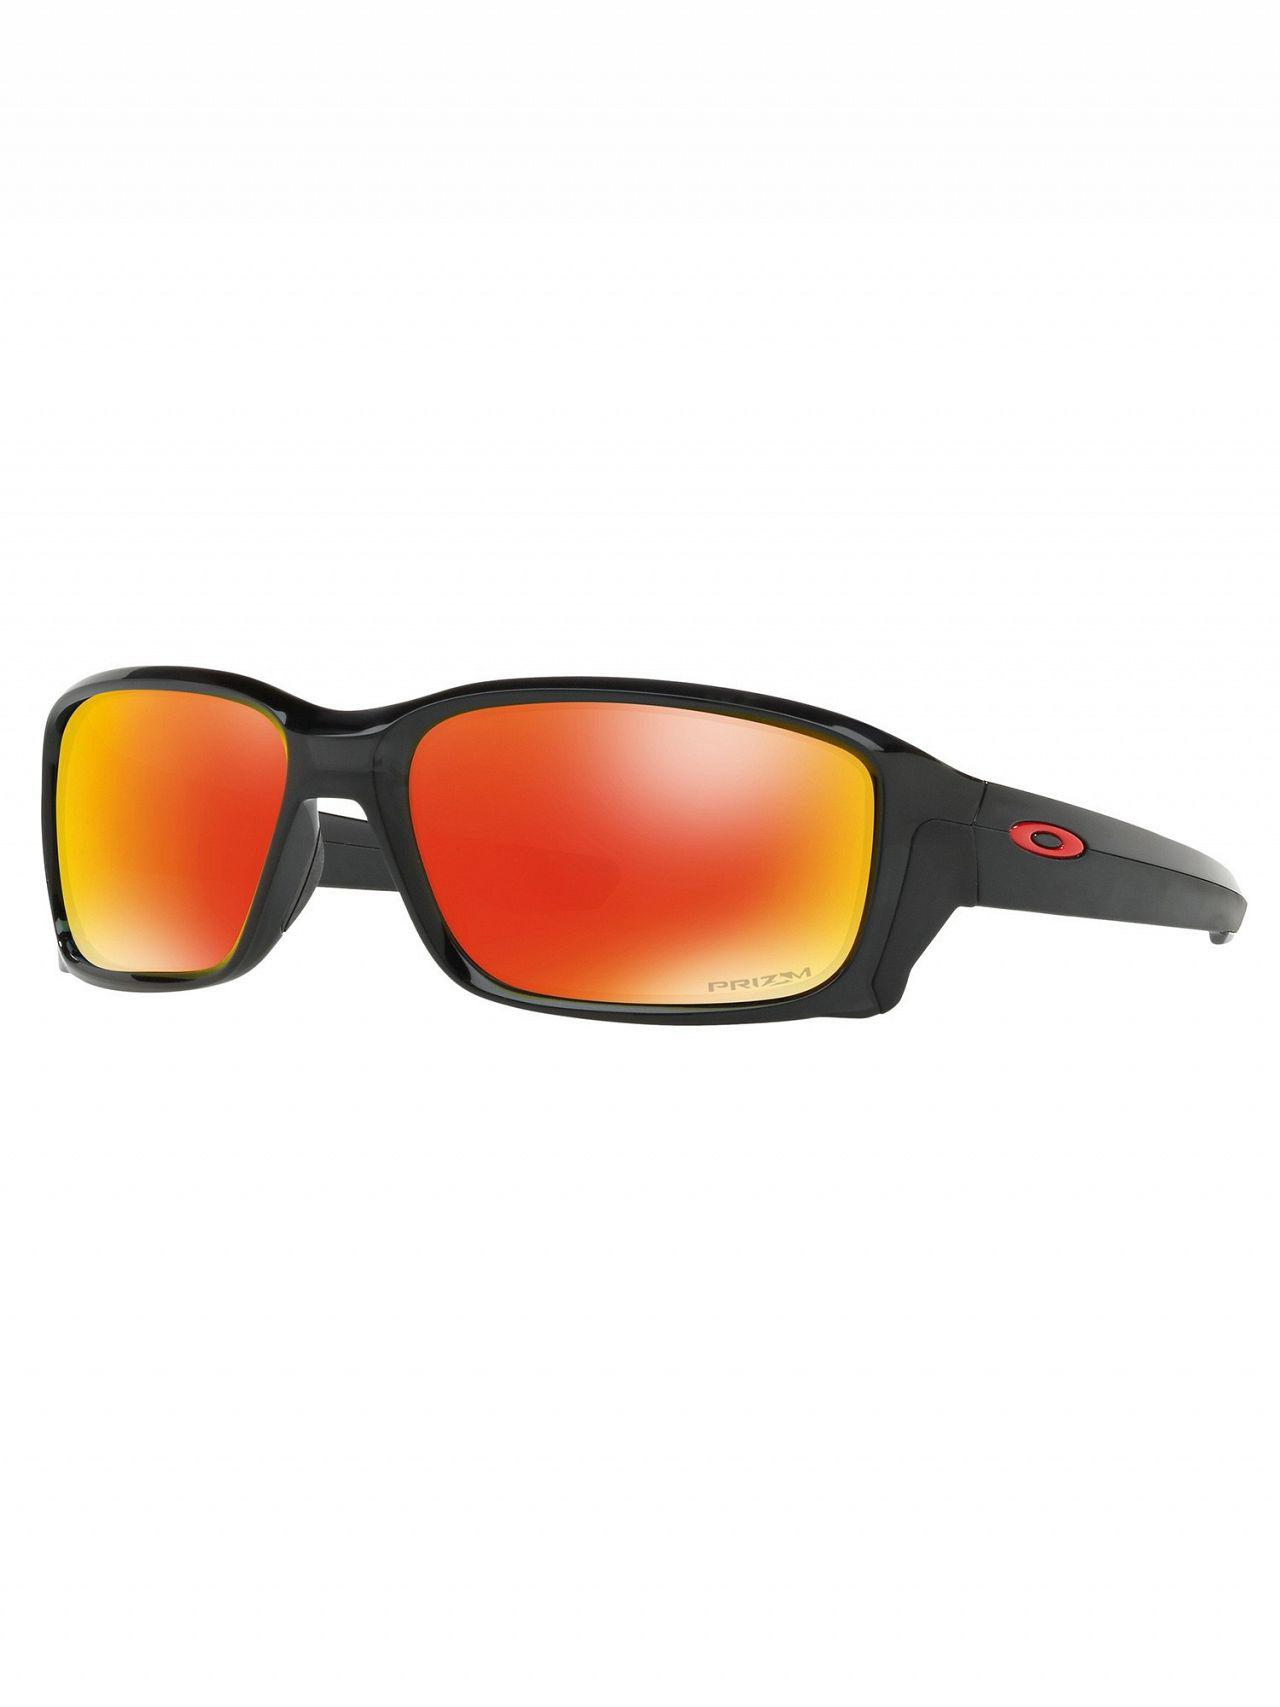 Oakley Straightlink Sonnenbrille Black Ink/Prizm Ruby c71PQfIvm